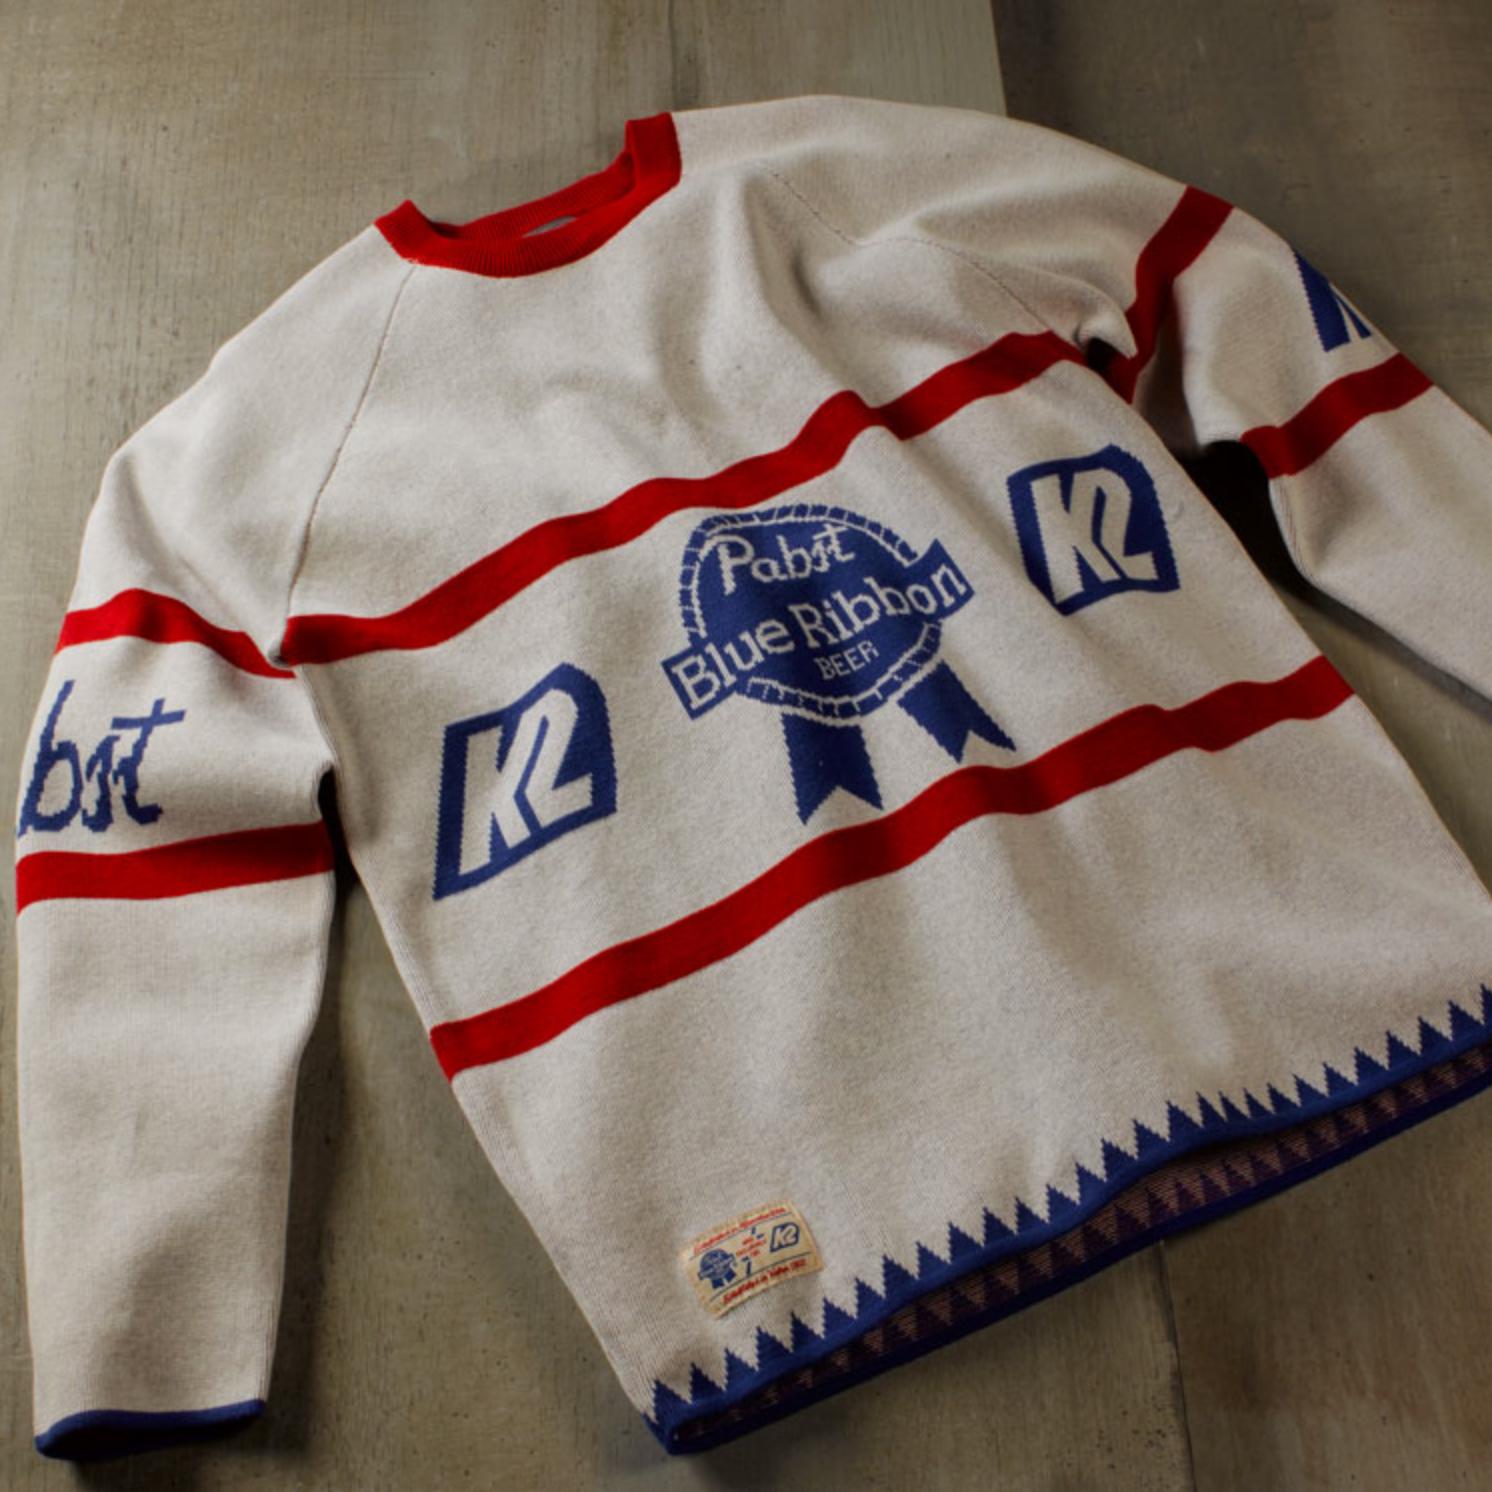 K2 / PBR Sweater